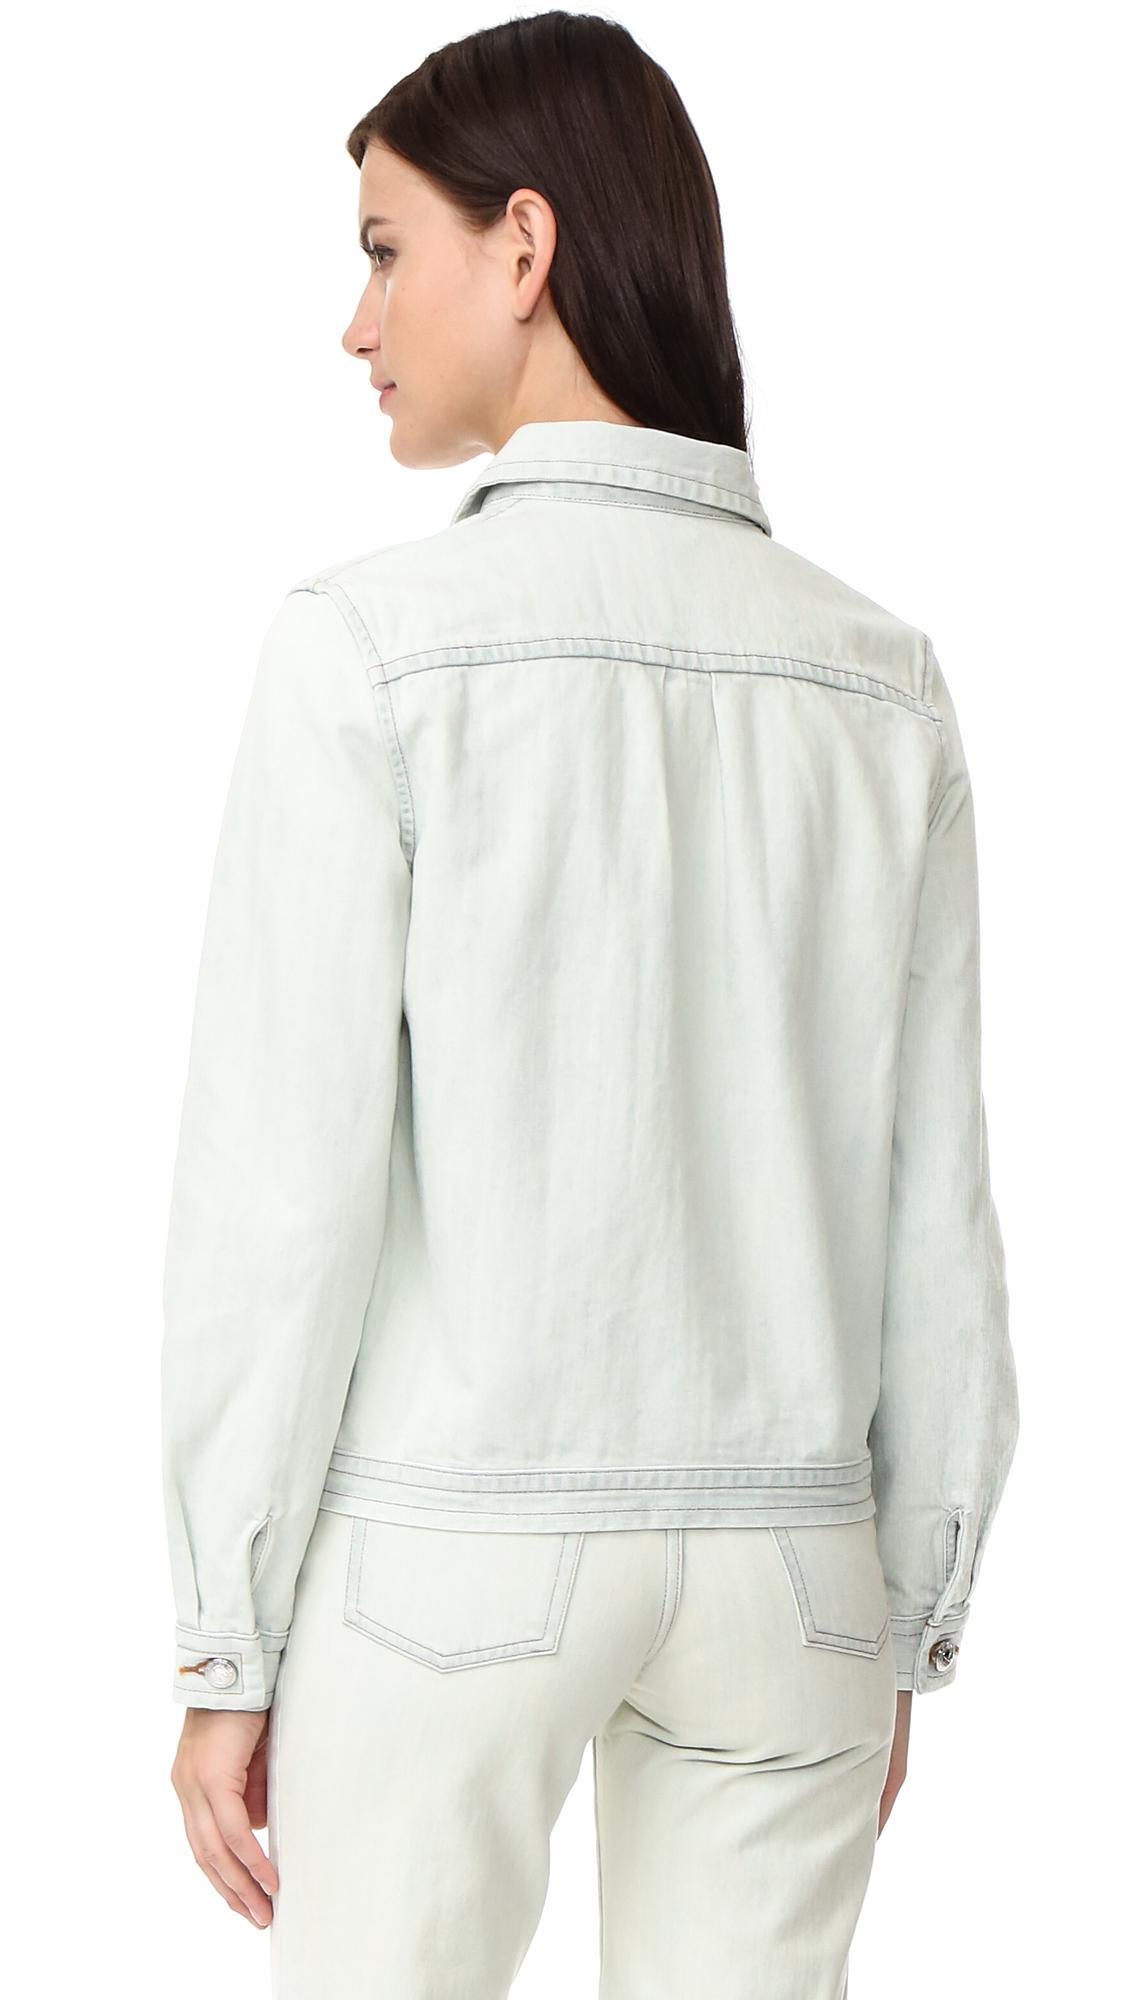 608e3d23a2c Lyst - A.P.C. Shirley Denim Jacket